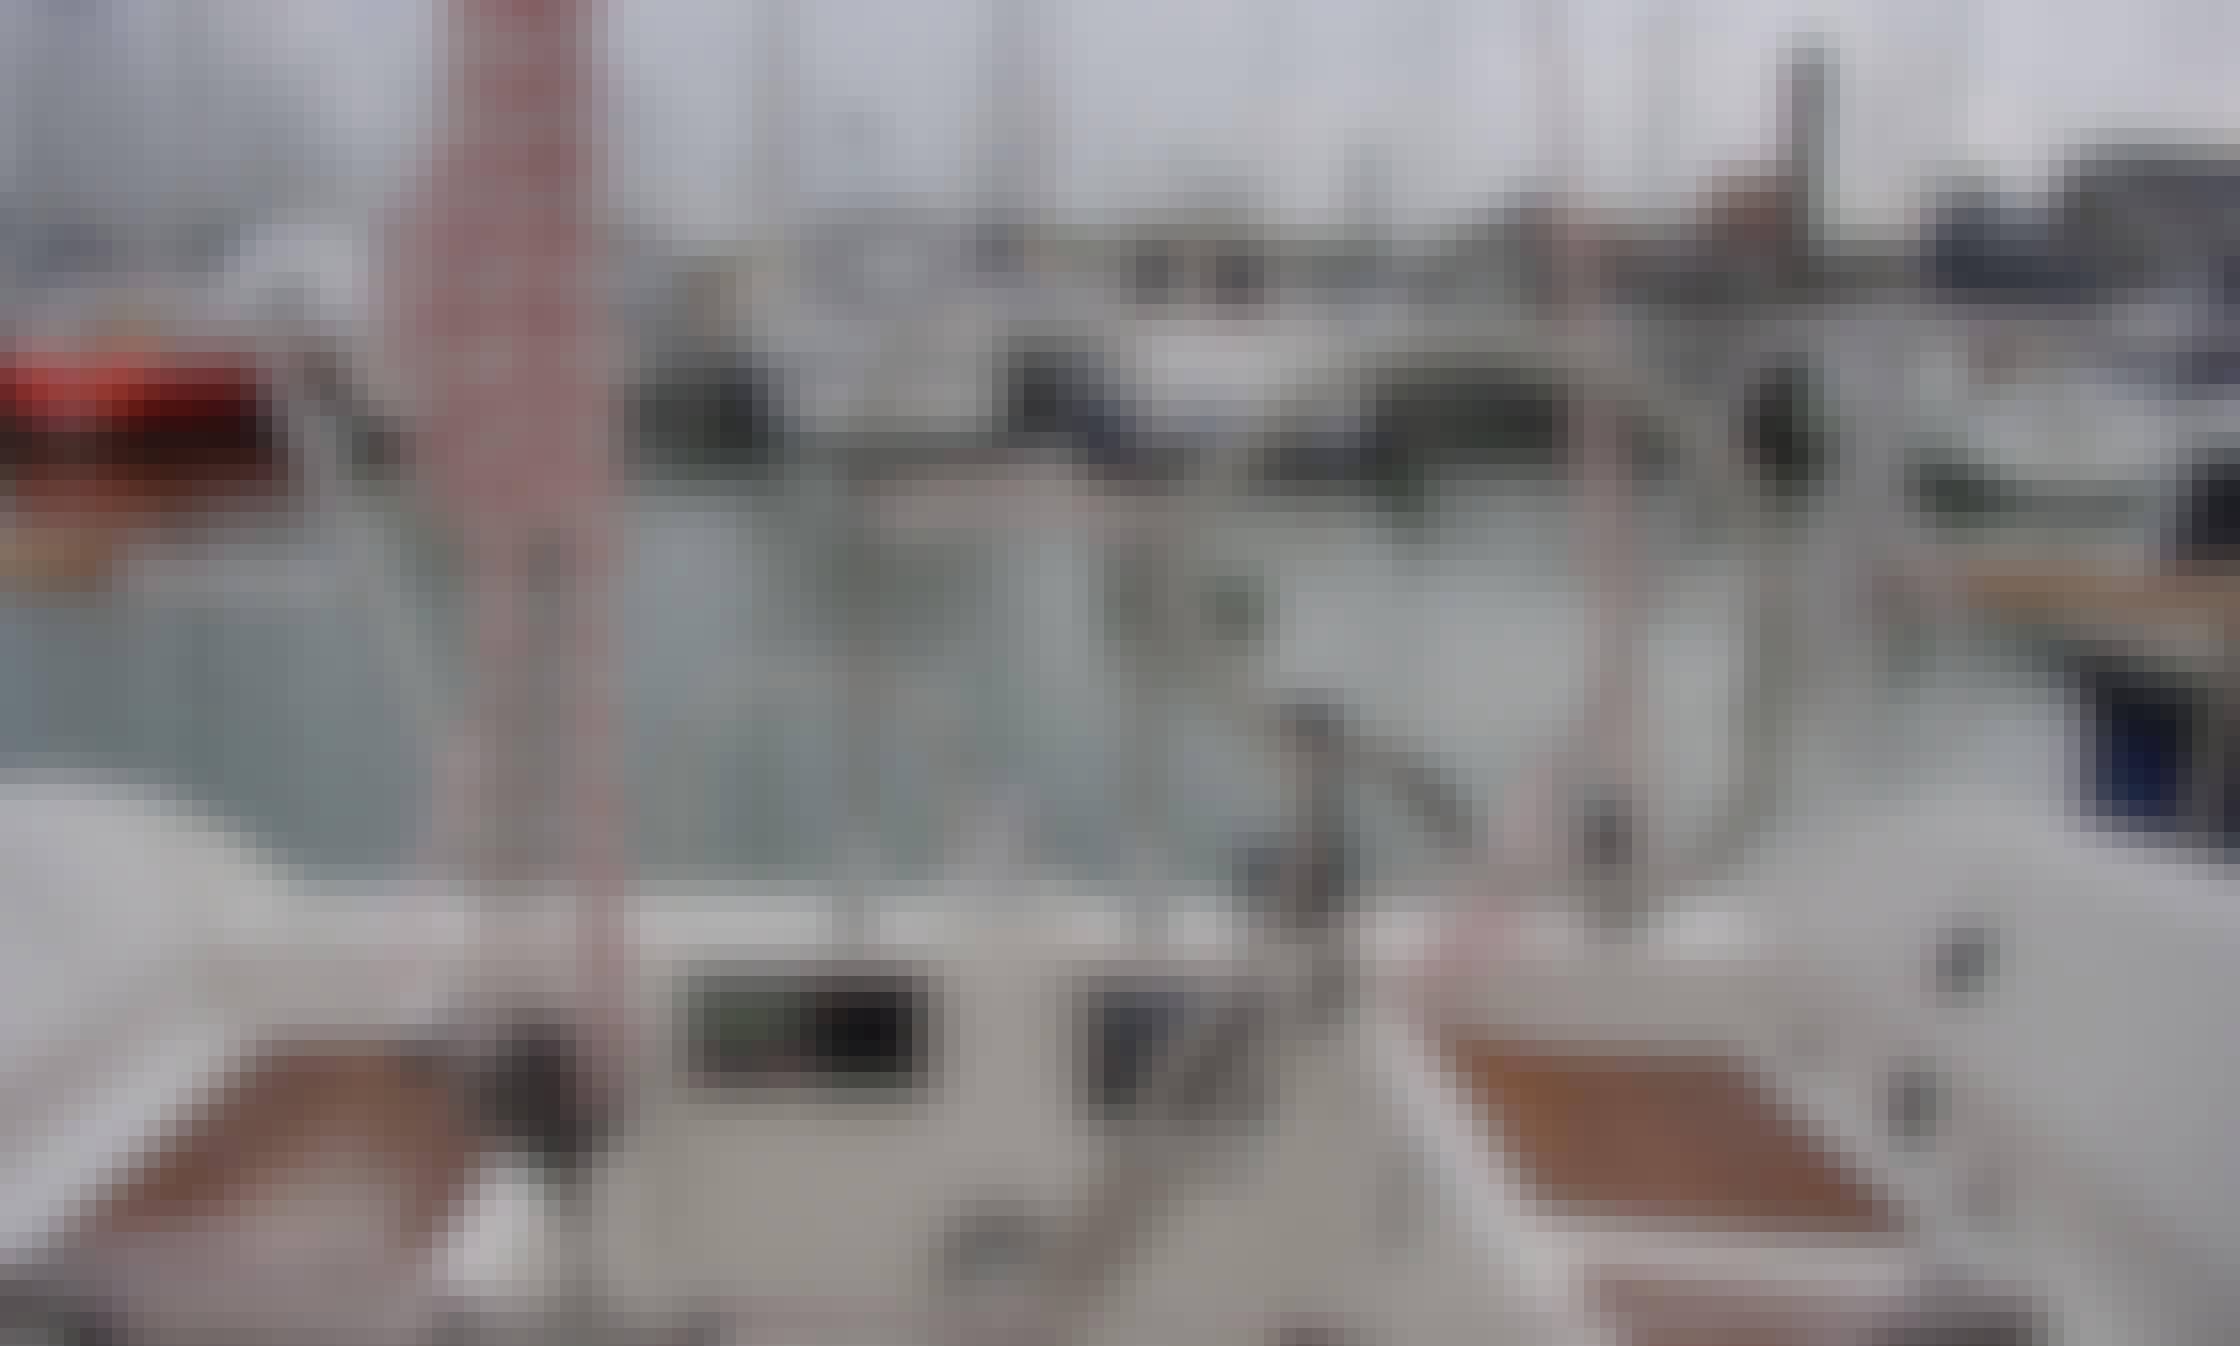 Sailboat Charter on Braassemermeer